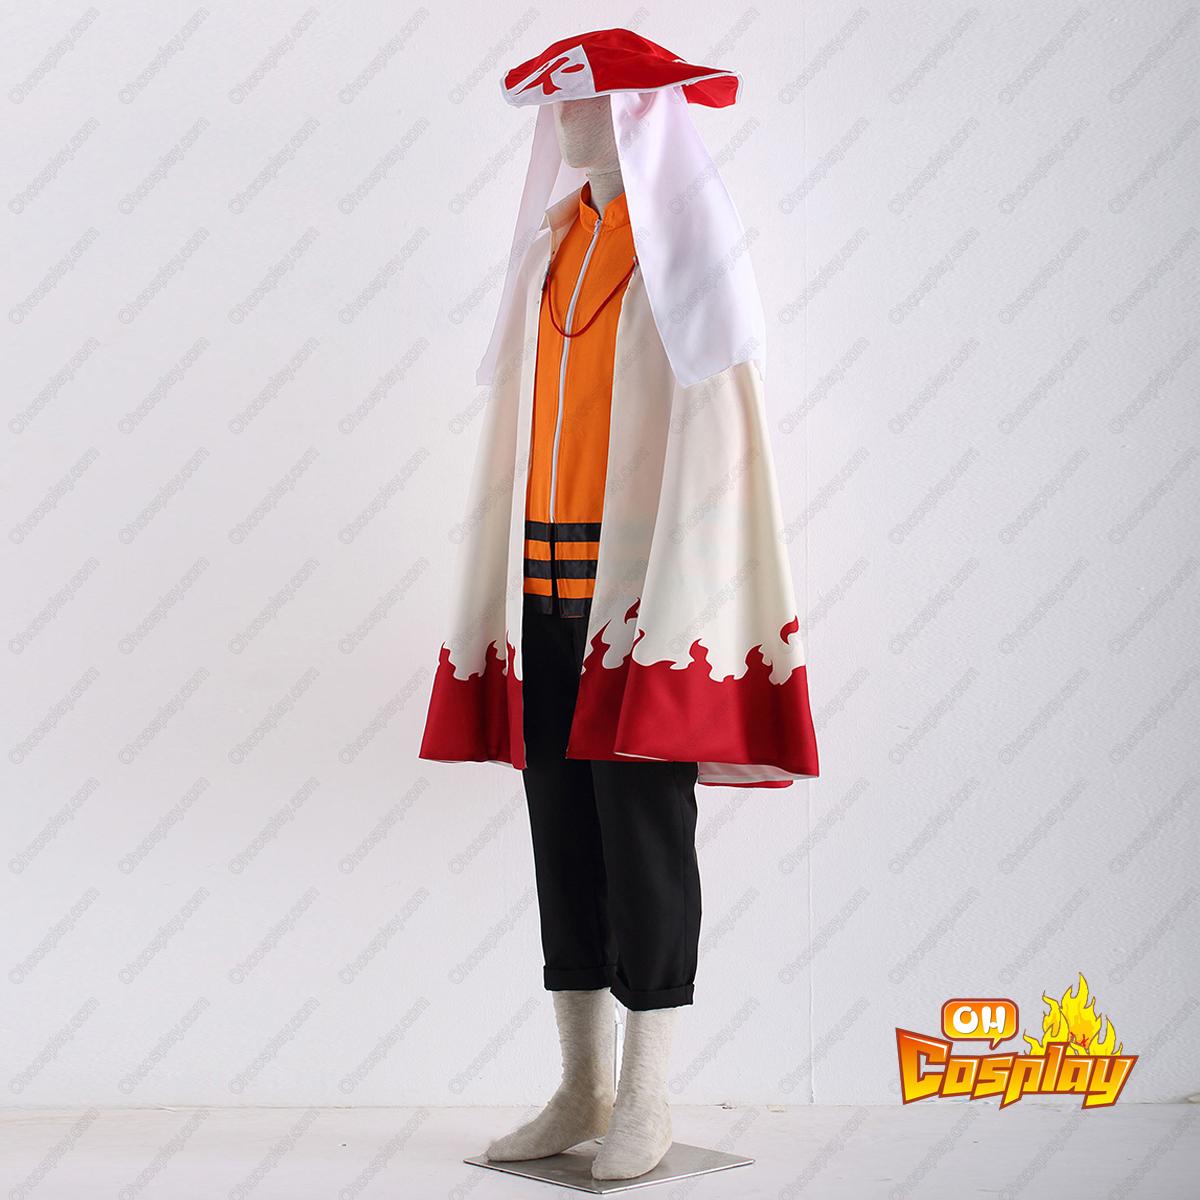 Naruto Shippuuden Naruto Uzumaki 12TH Cosplay Costumes Deluxe Edition